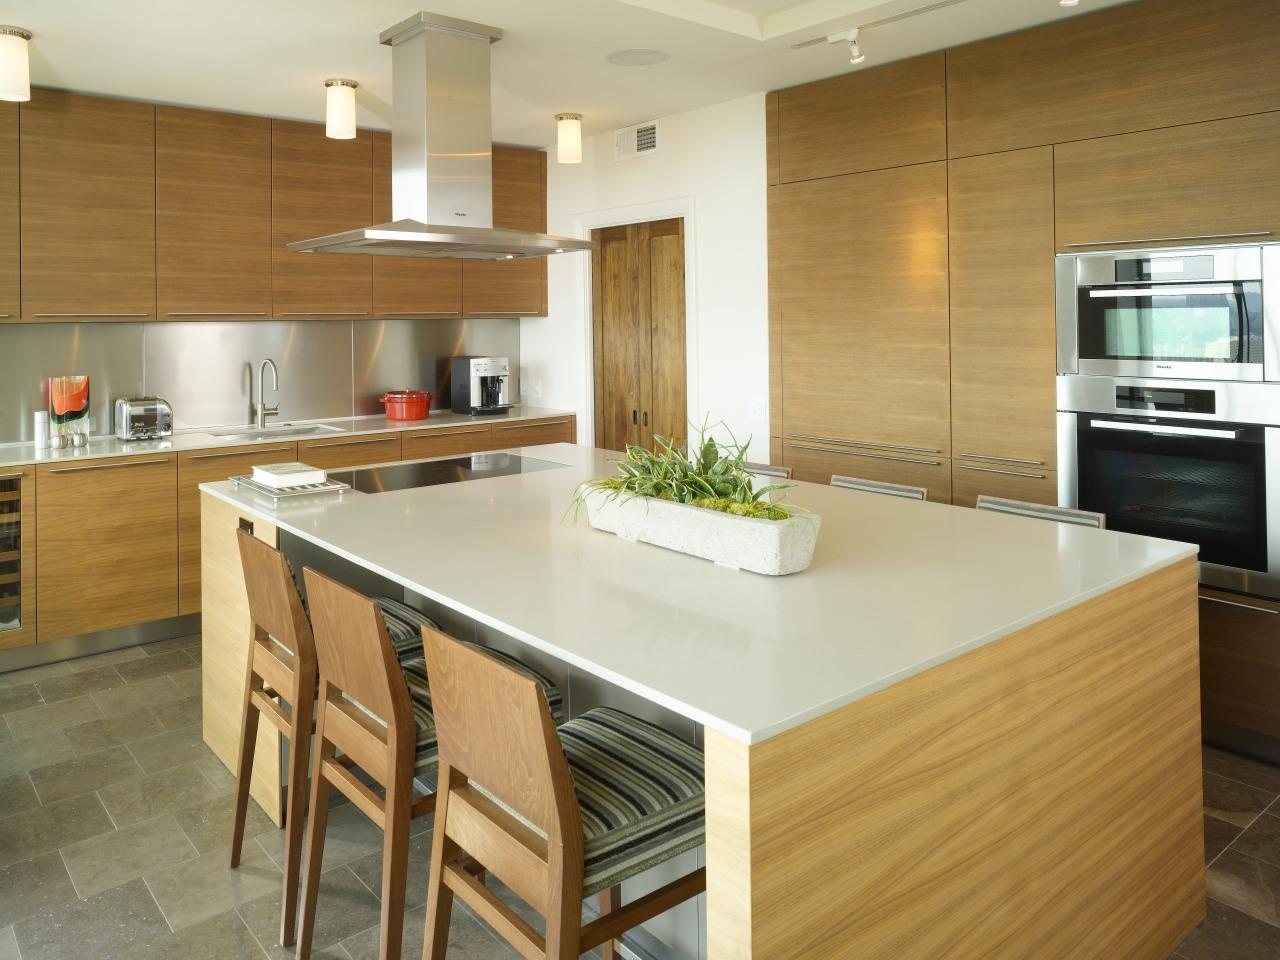 Architectural designer Mark Williams specified sleek Bulthaup walnut cabinetry, countertop, cuisine classique, floor, flooring, hardwood, interior design, kitchen, real estate, room, wood flooring, brown, orange